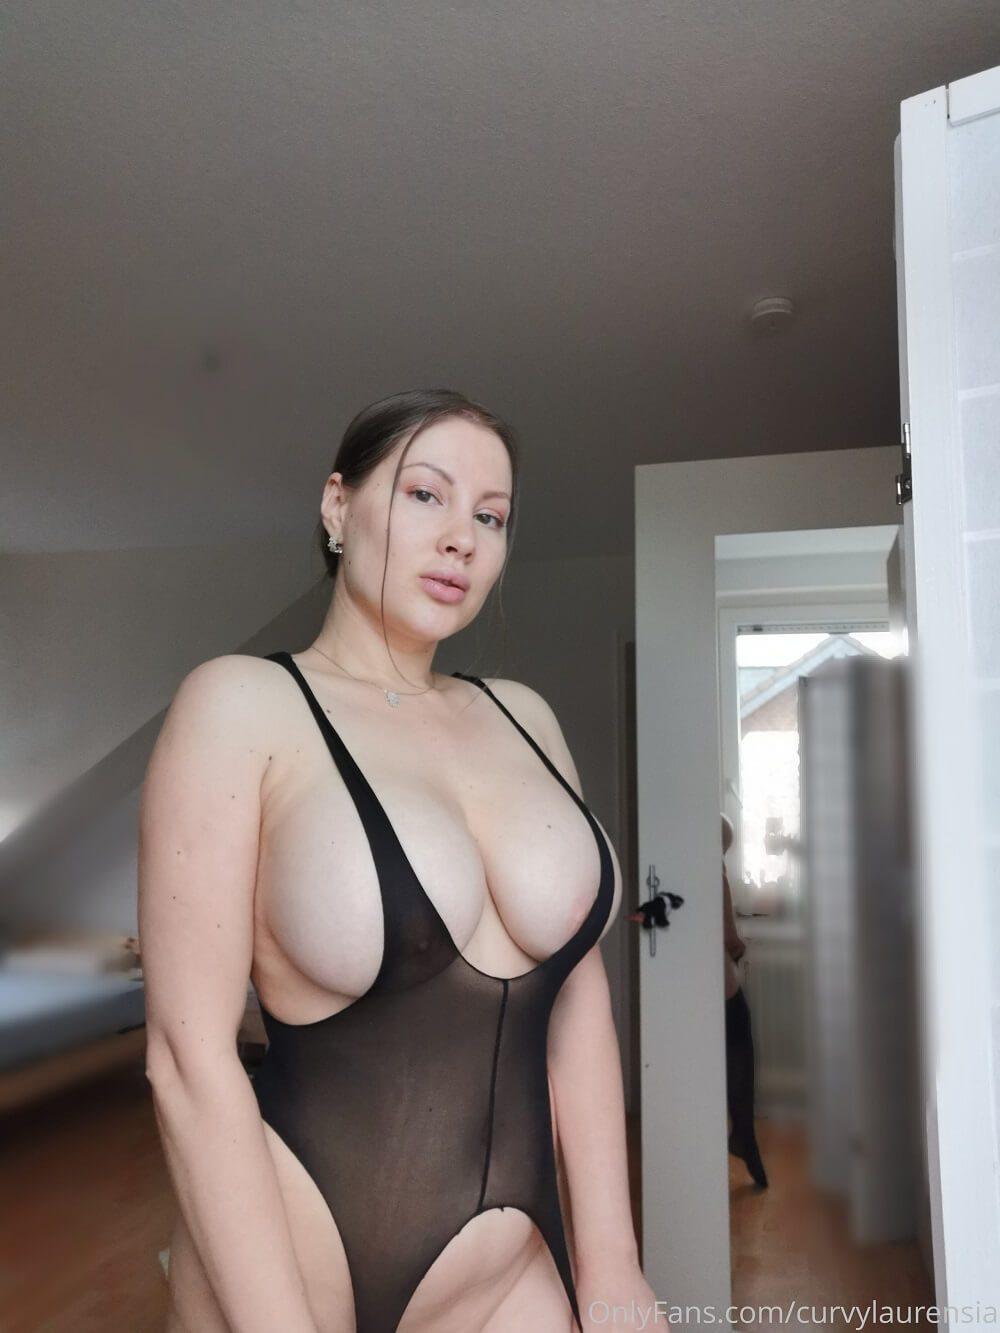 Curvy Laurensia